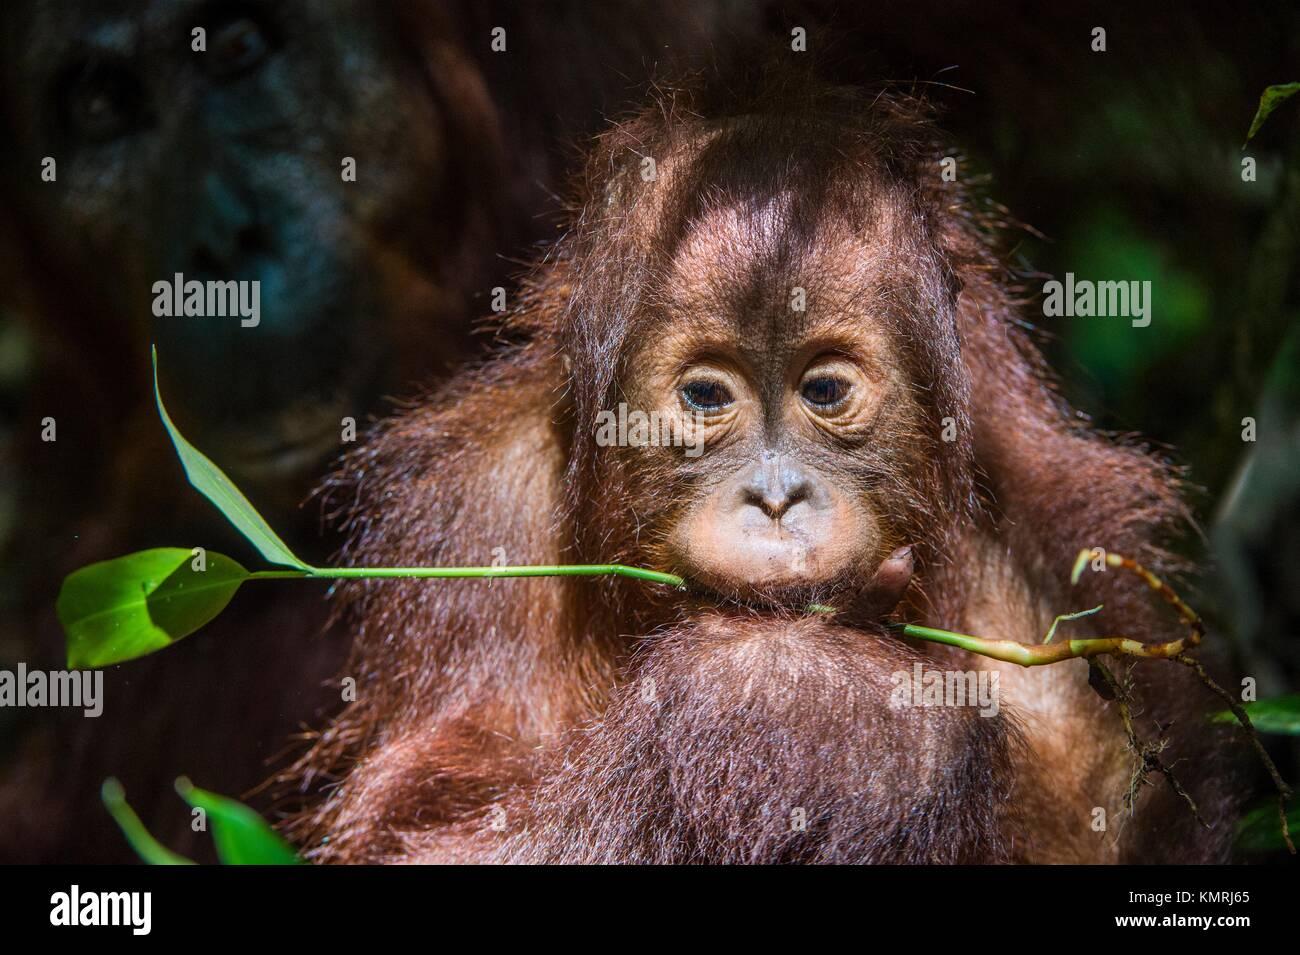 Baby orangutan (Pongo pygmaeus). The close up portrait of cub f of the orangutanon with green leaf on the dark background. - Stock Image